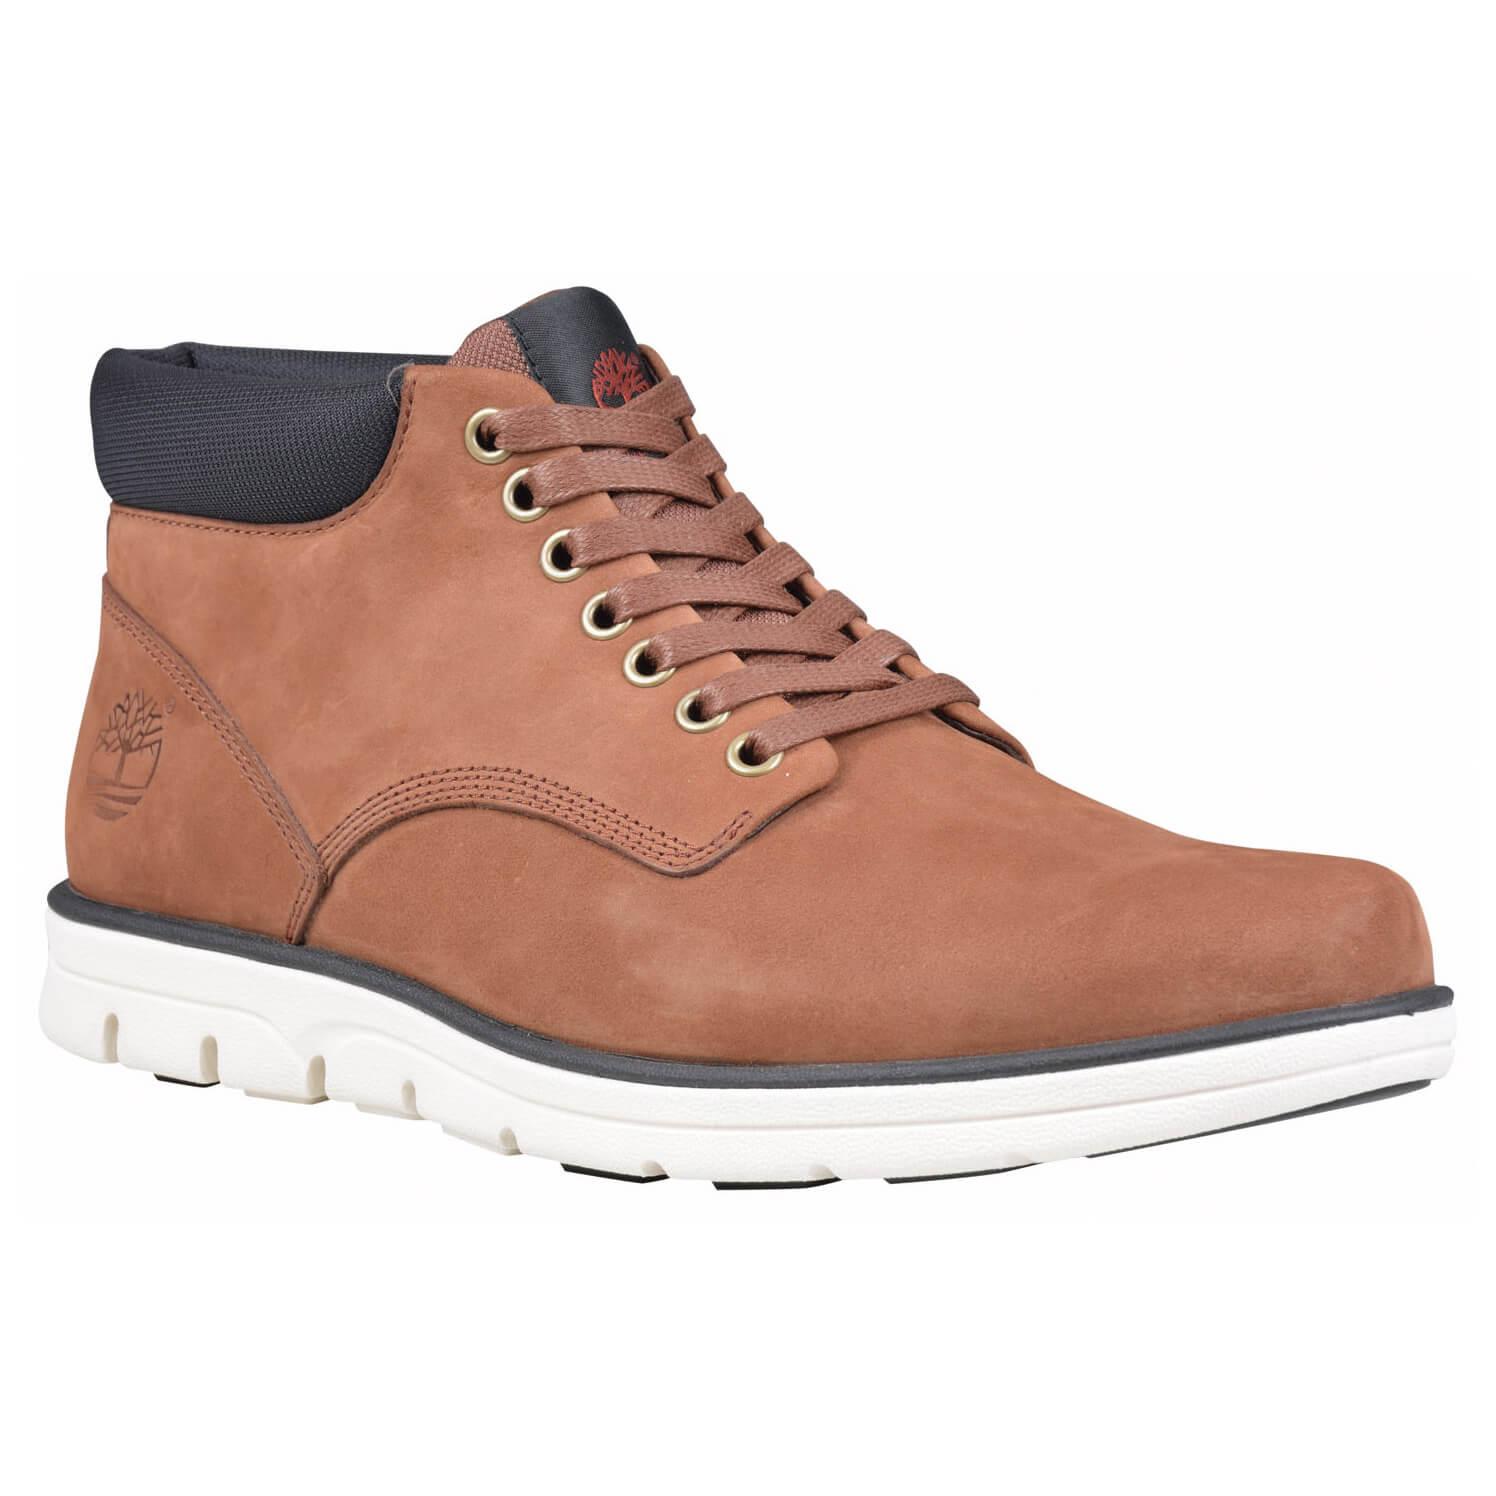 Timberland Bradstreet Chukka Leather Sneaker Herren